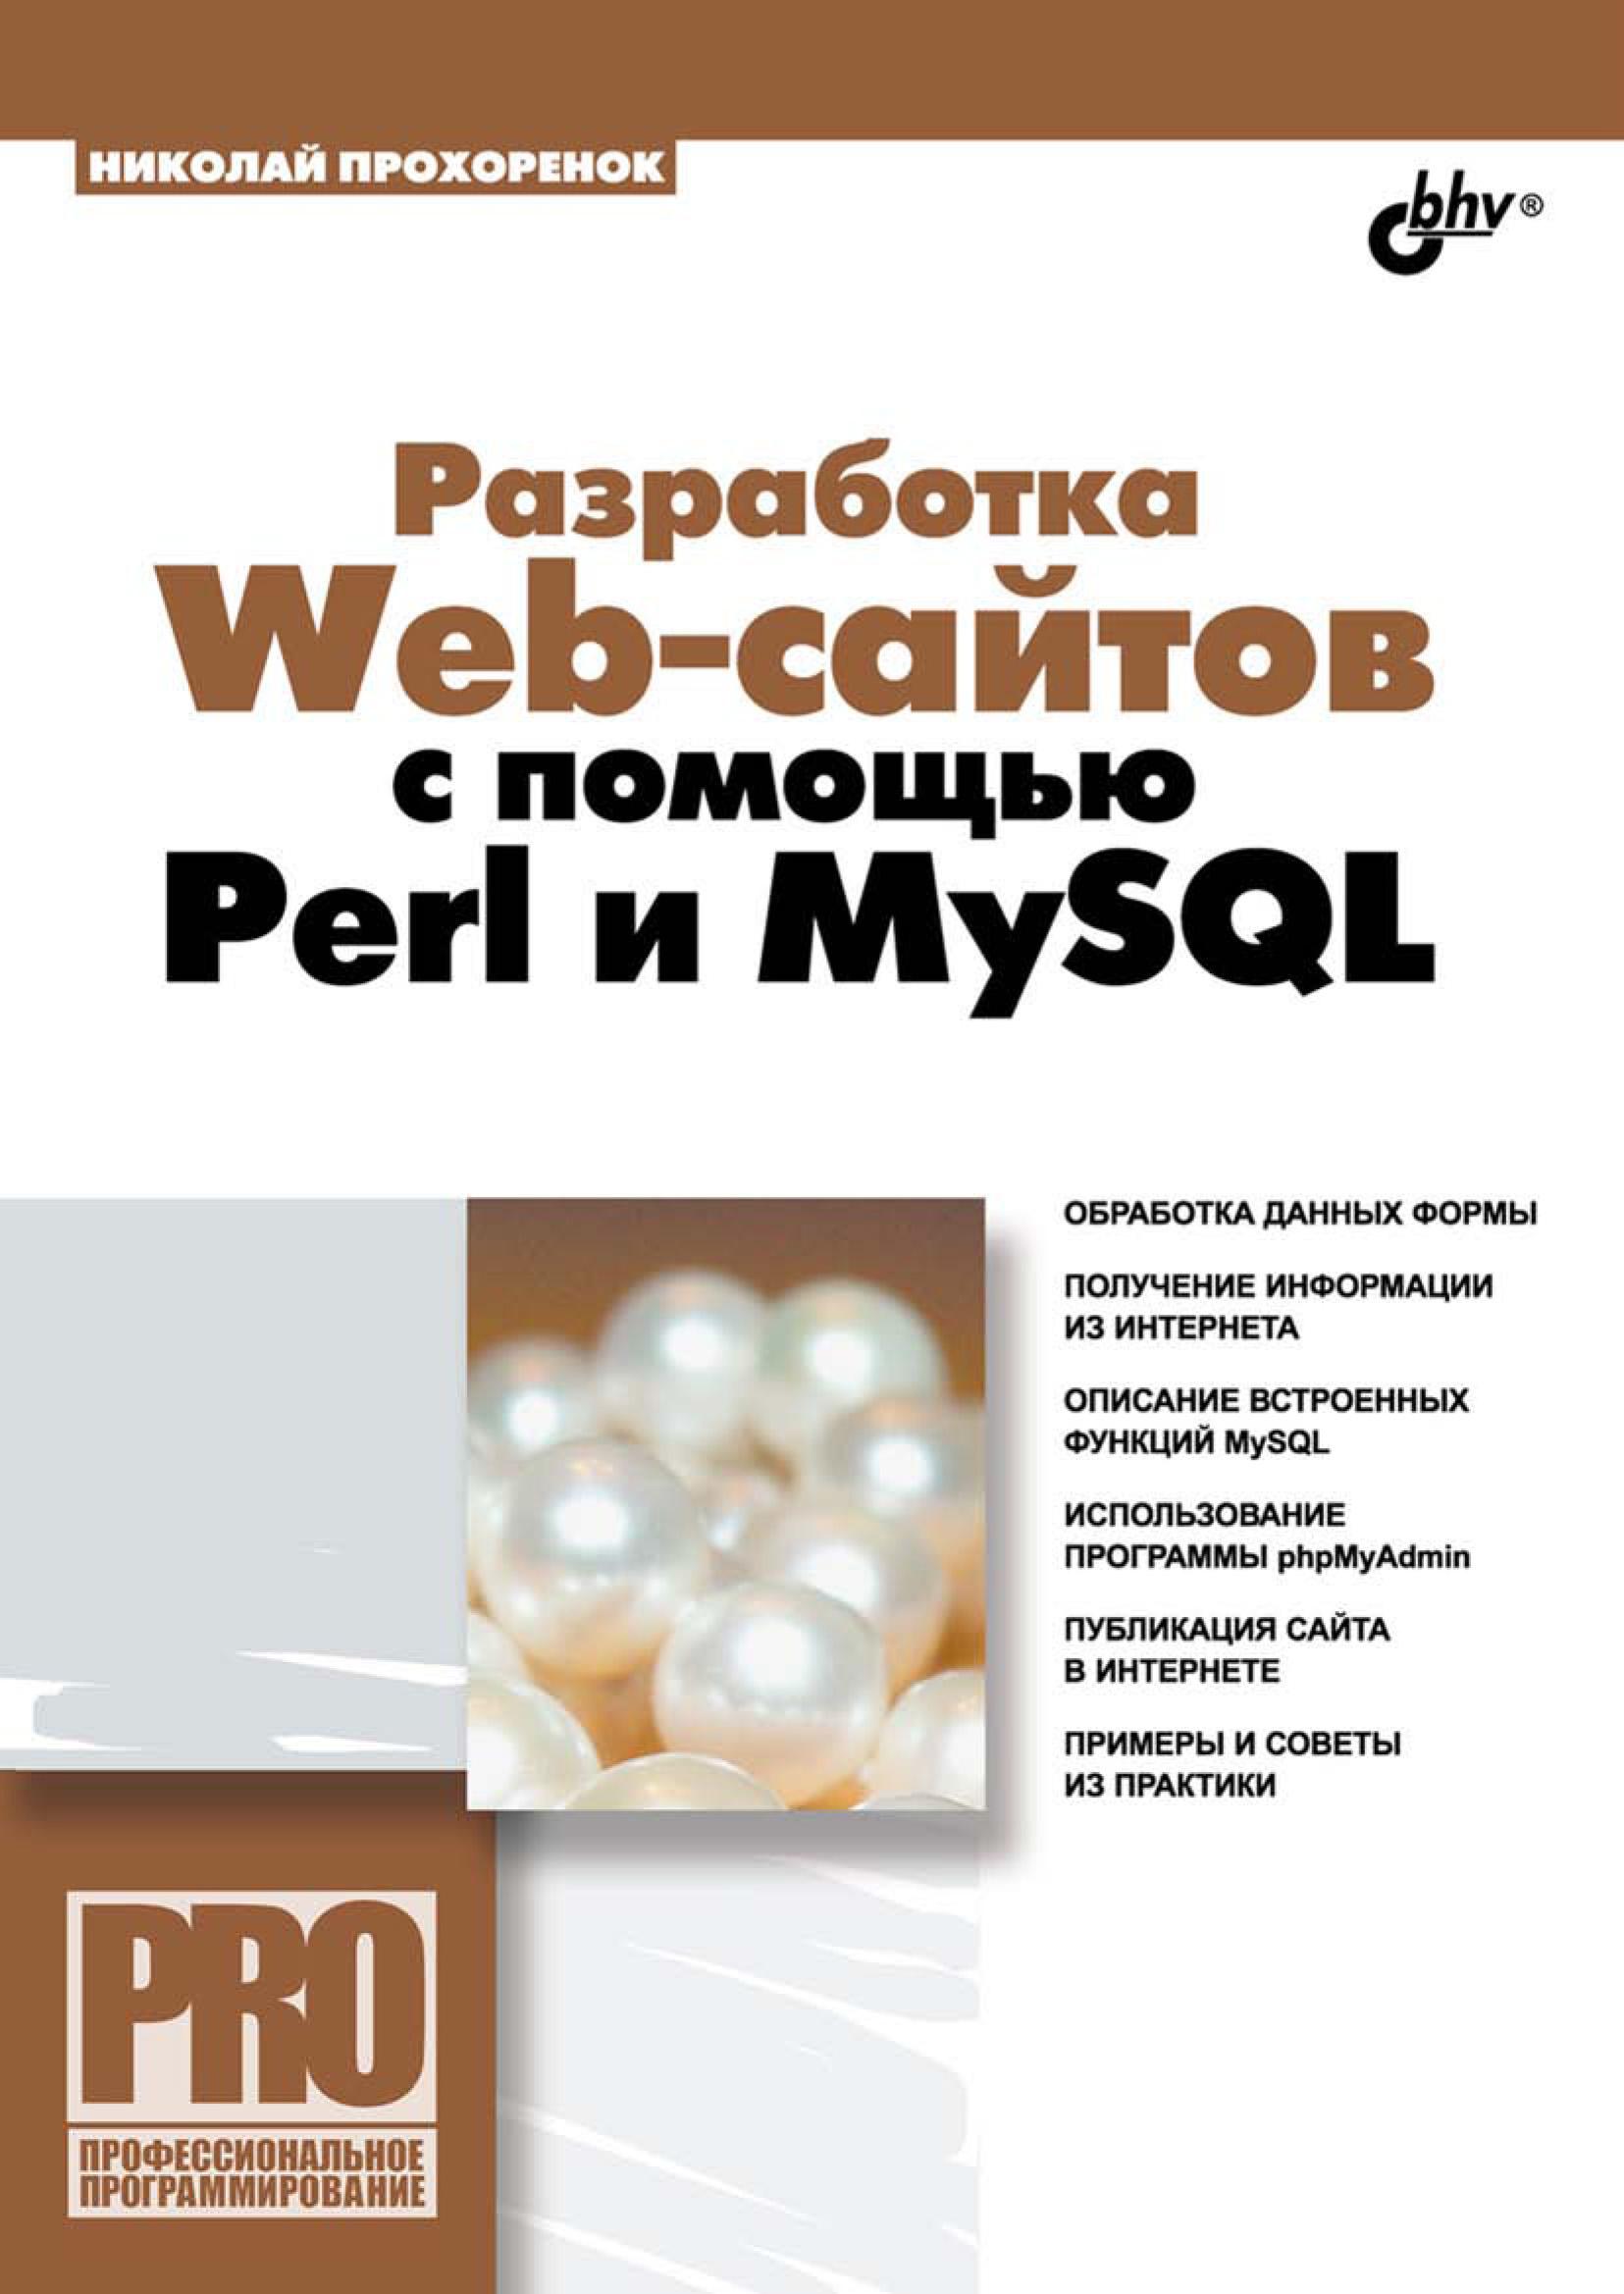 цена на Николай Прохоренок Разработка Web-сайтов с помощью Perl и MySQL